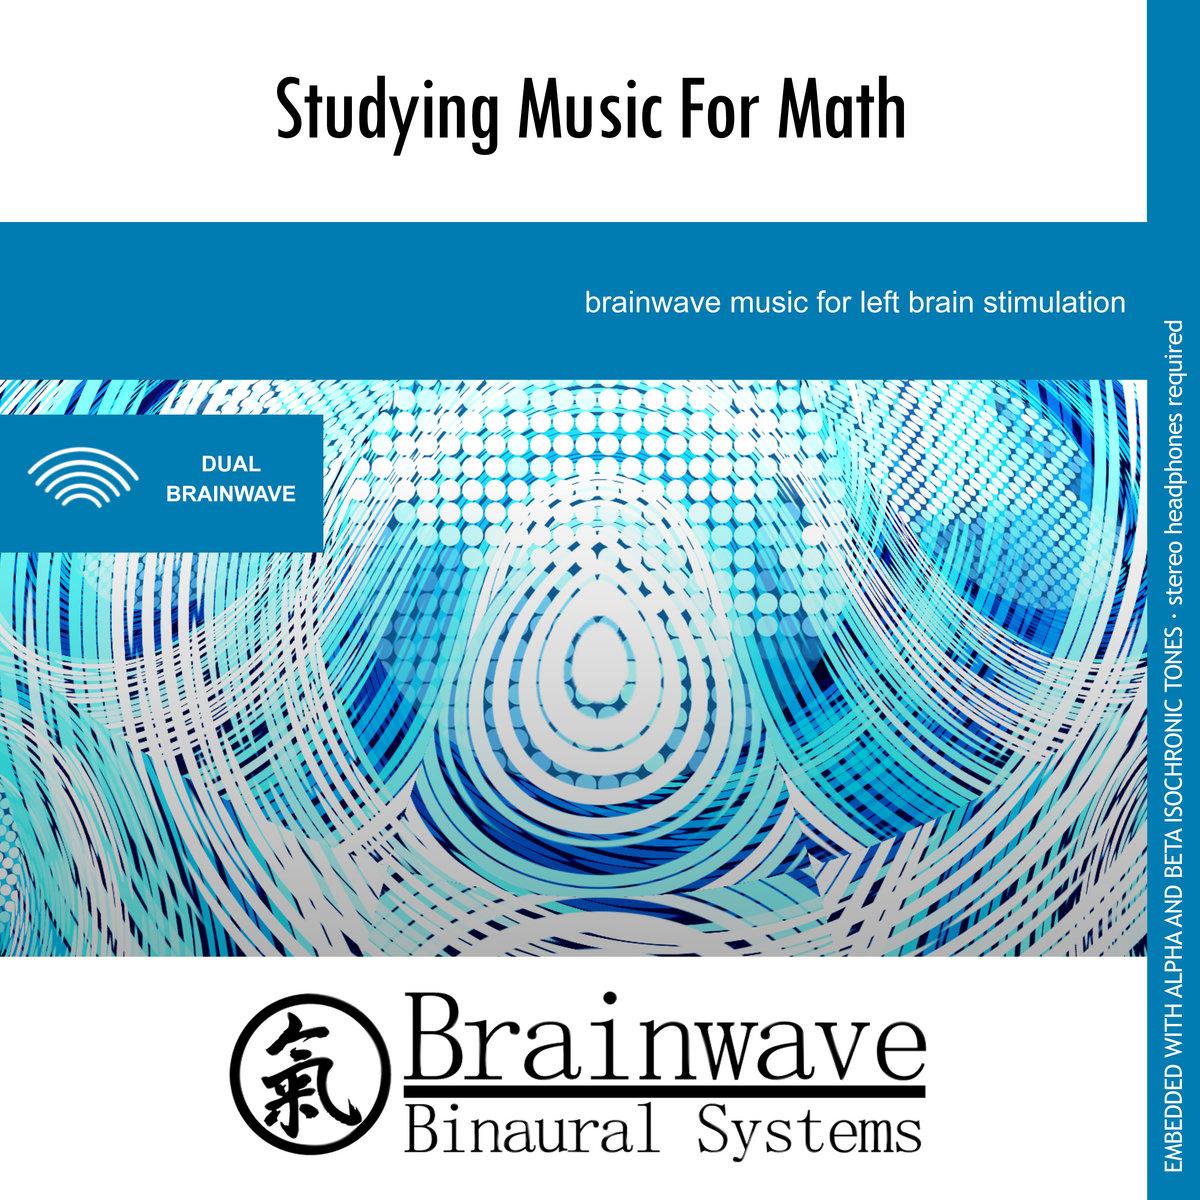 Music For Studying Math | Brainwave Binaural Systems